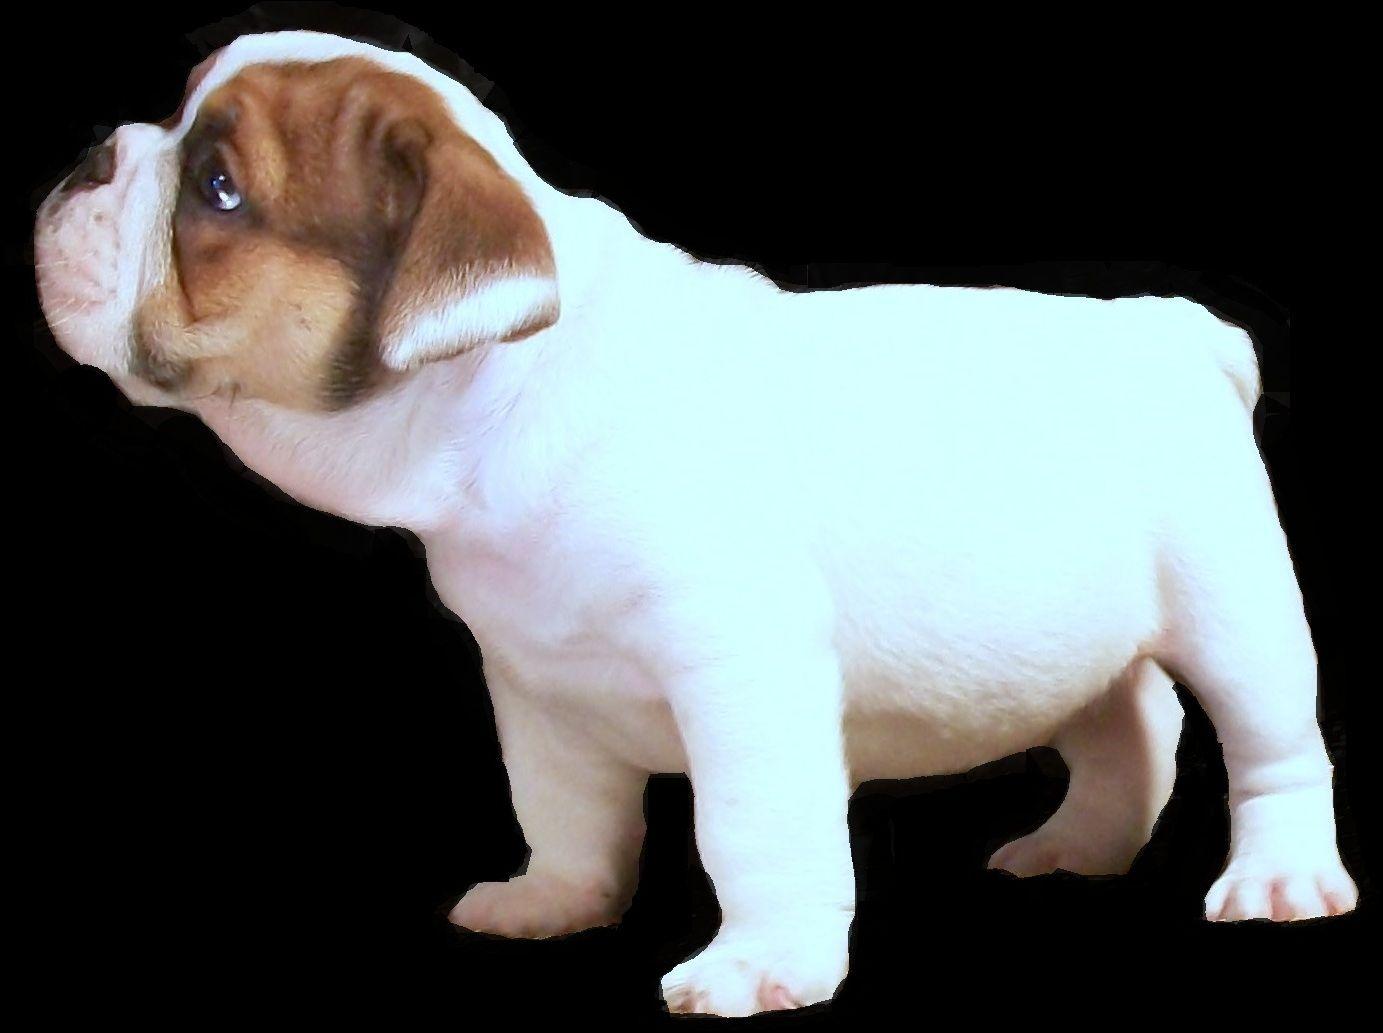 Available Bulldogs Ohio Rare Bulldog Breeder Black Black Tan Blue Chocolate Tri Colored Trindled Sab With Images Bulldog Puppies Bulldog English Bulldog Breeders